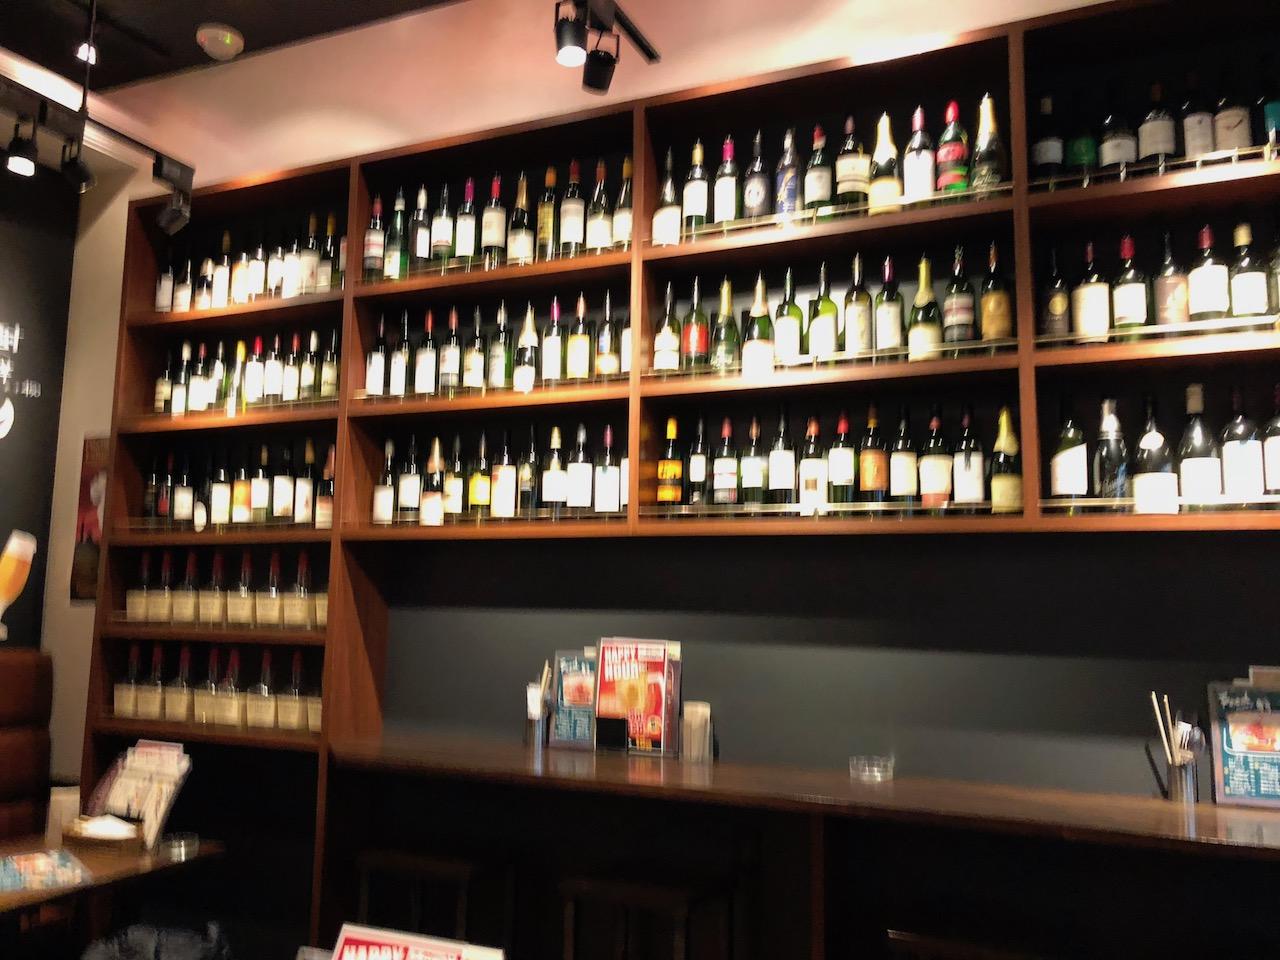 JR姫路駅徒歩30秒!必ず記憶を失くすTERMINI(テルミニ)で恒例のワイン飲み放題してきた!